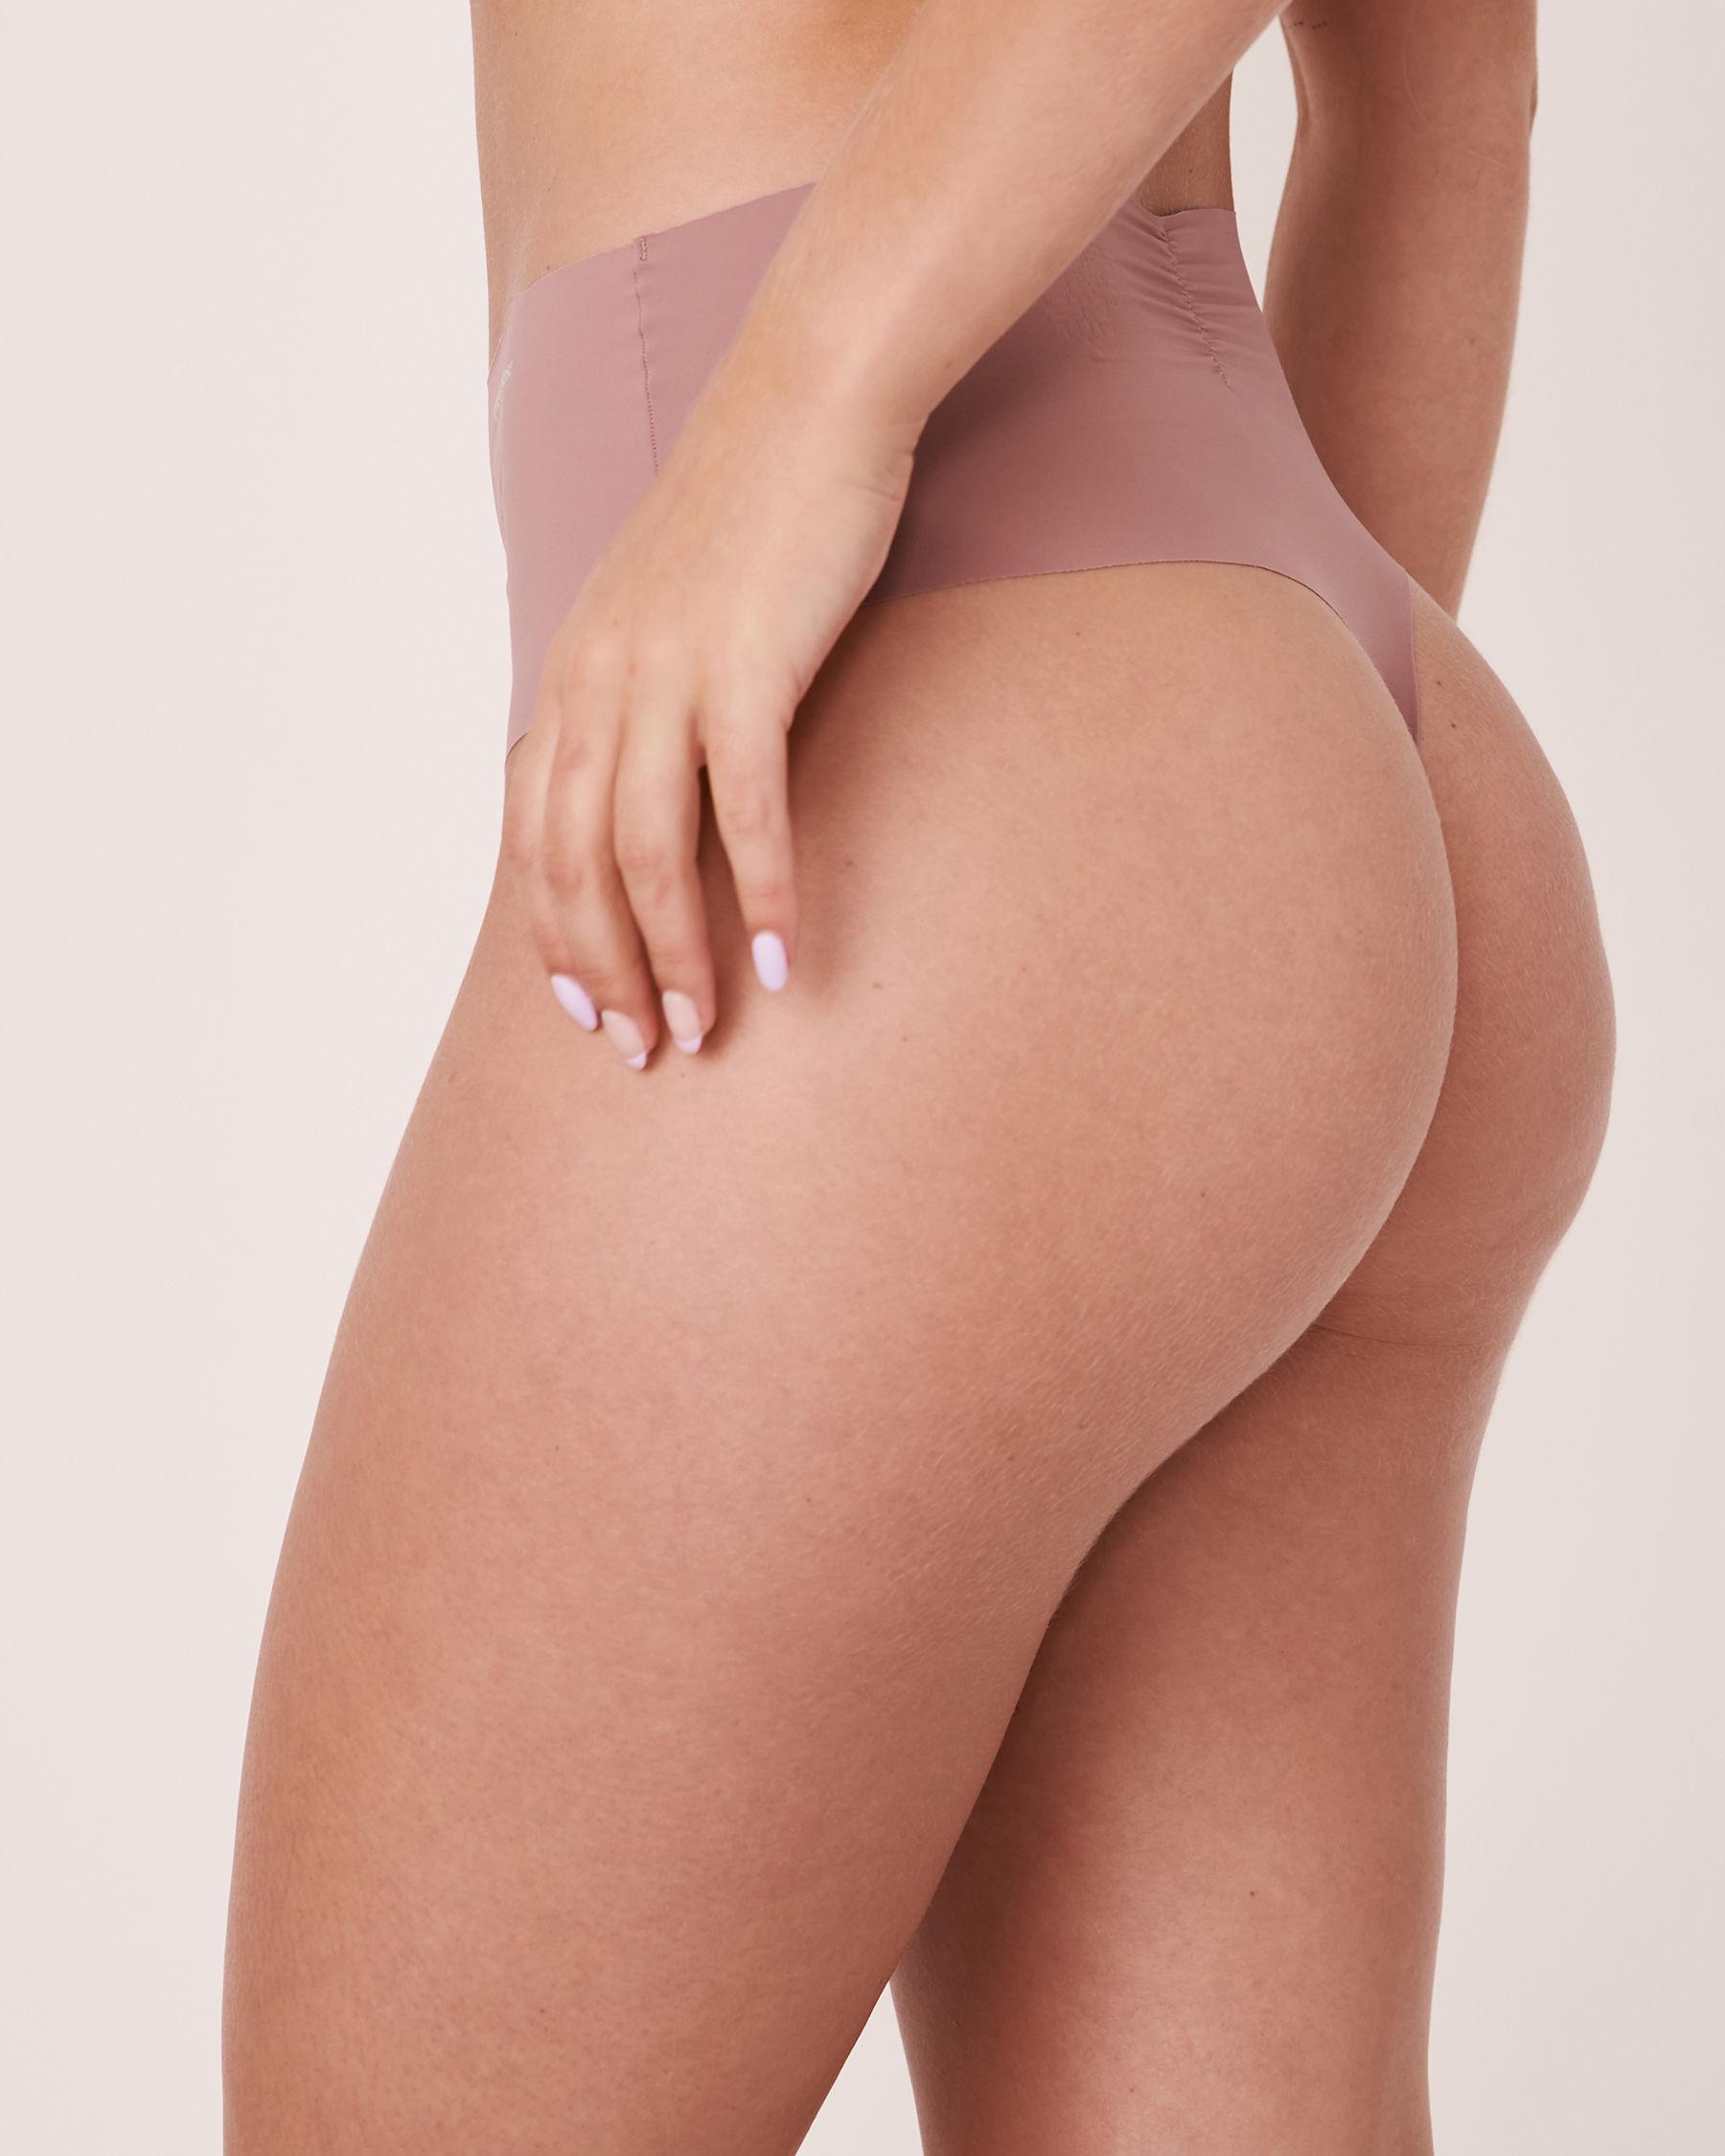 LA VIE EN ROSE Seamless High Waist Thong Panty Old pink 20200083 - View2